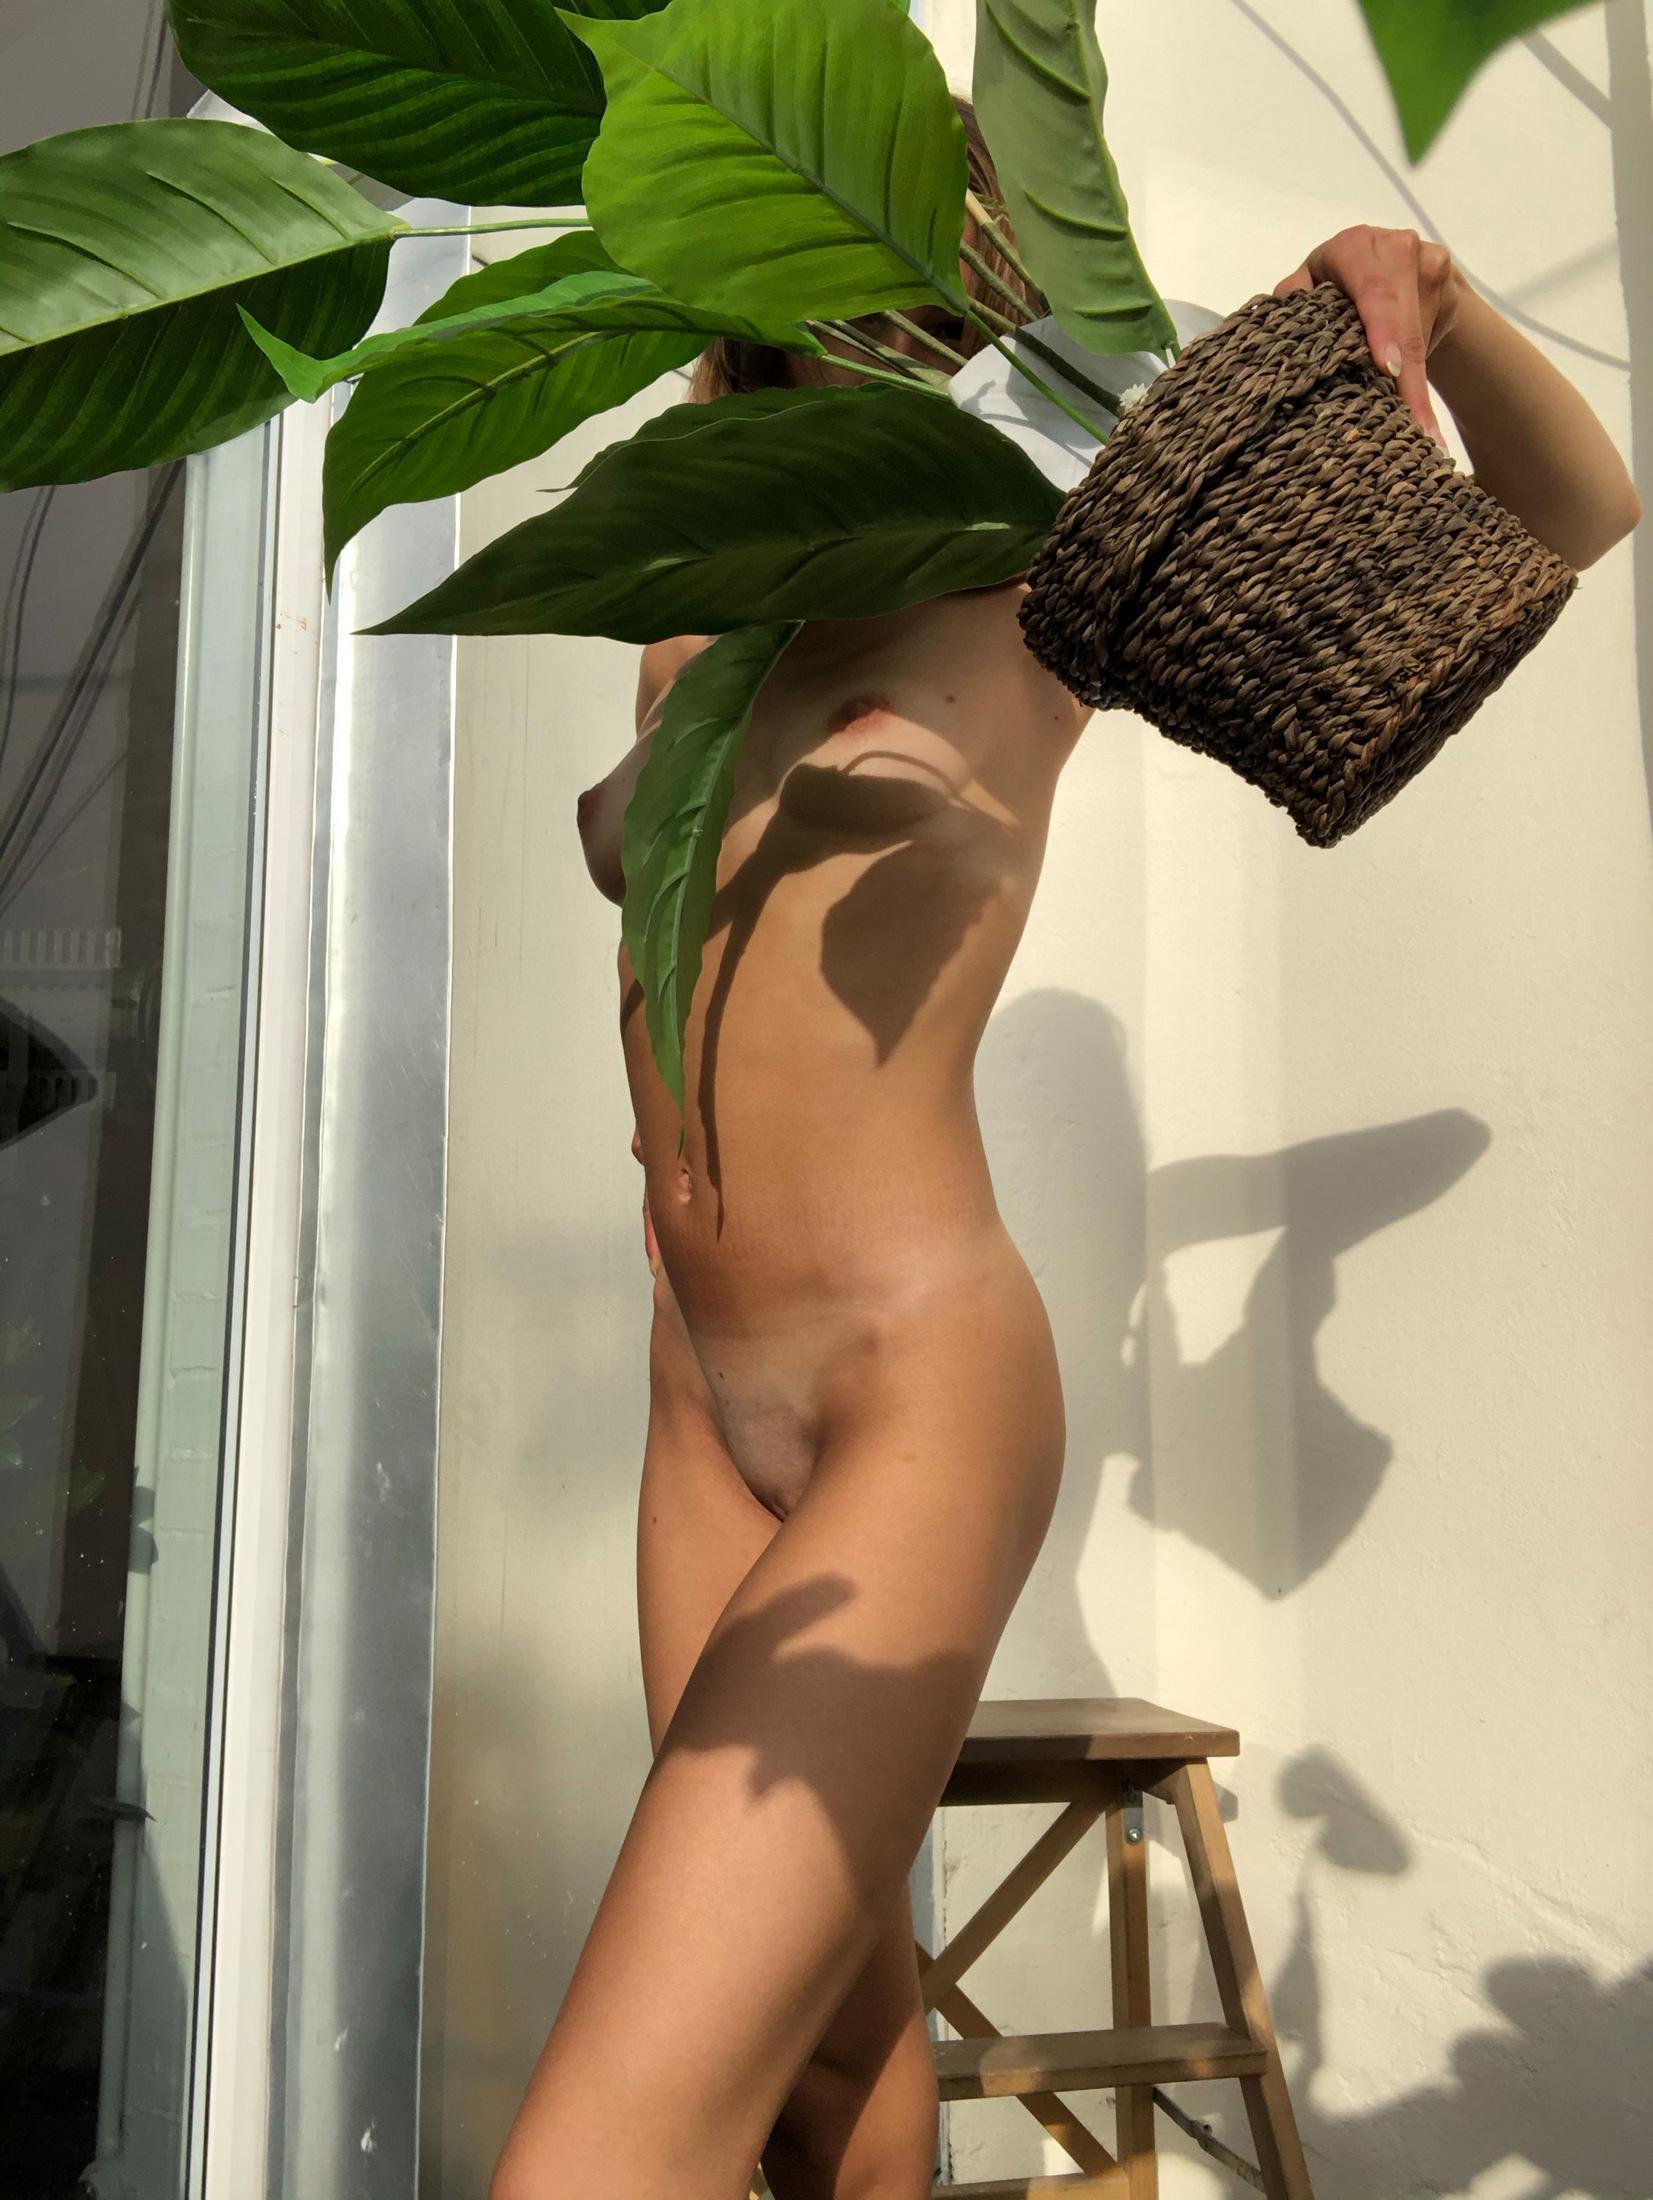 Ruslana Green - Selfies